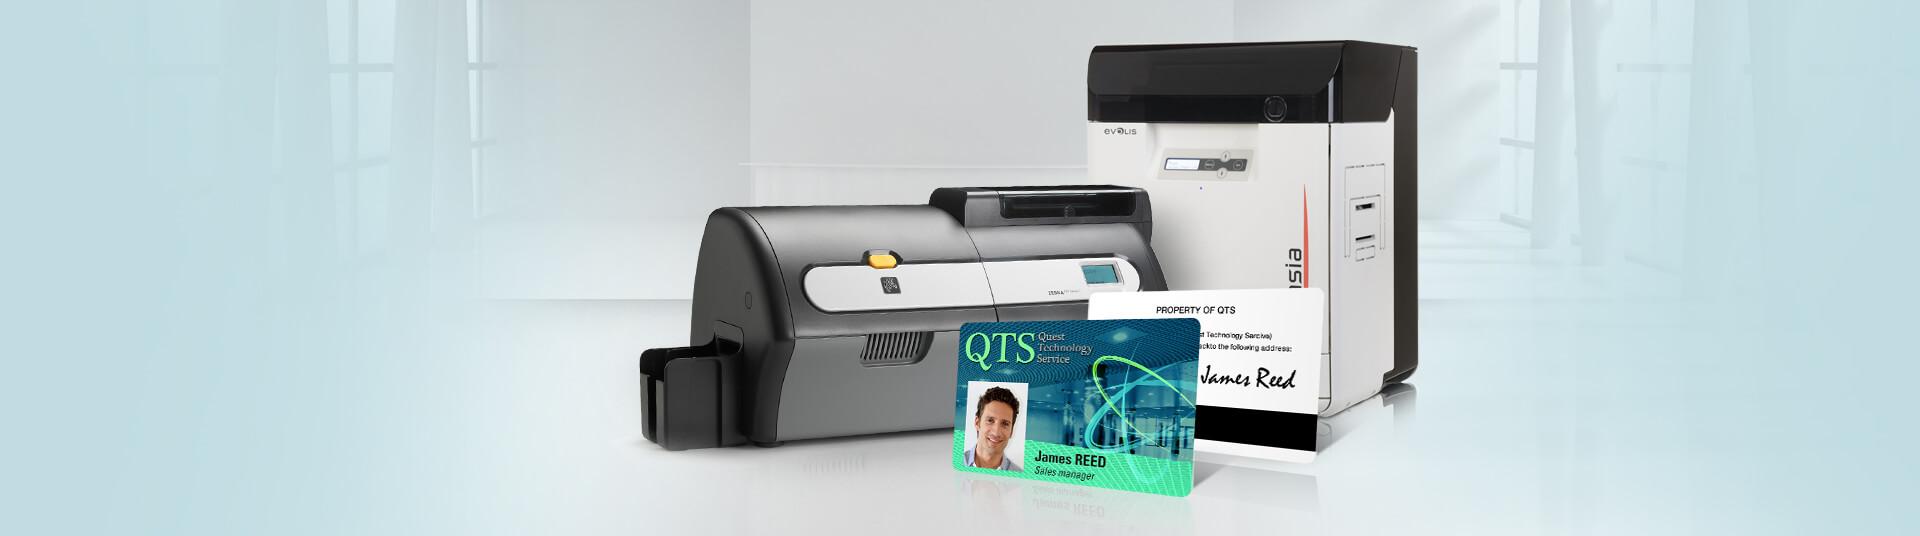 Dual-Sided ID Card Printers